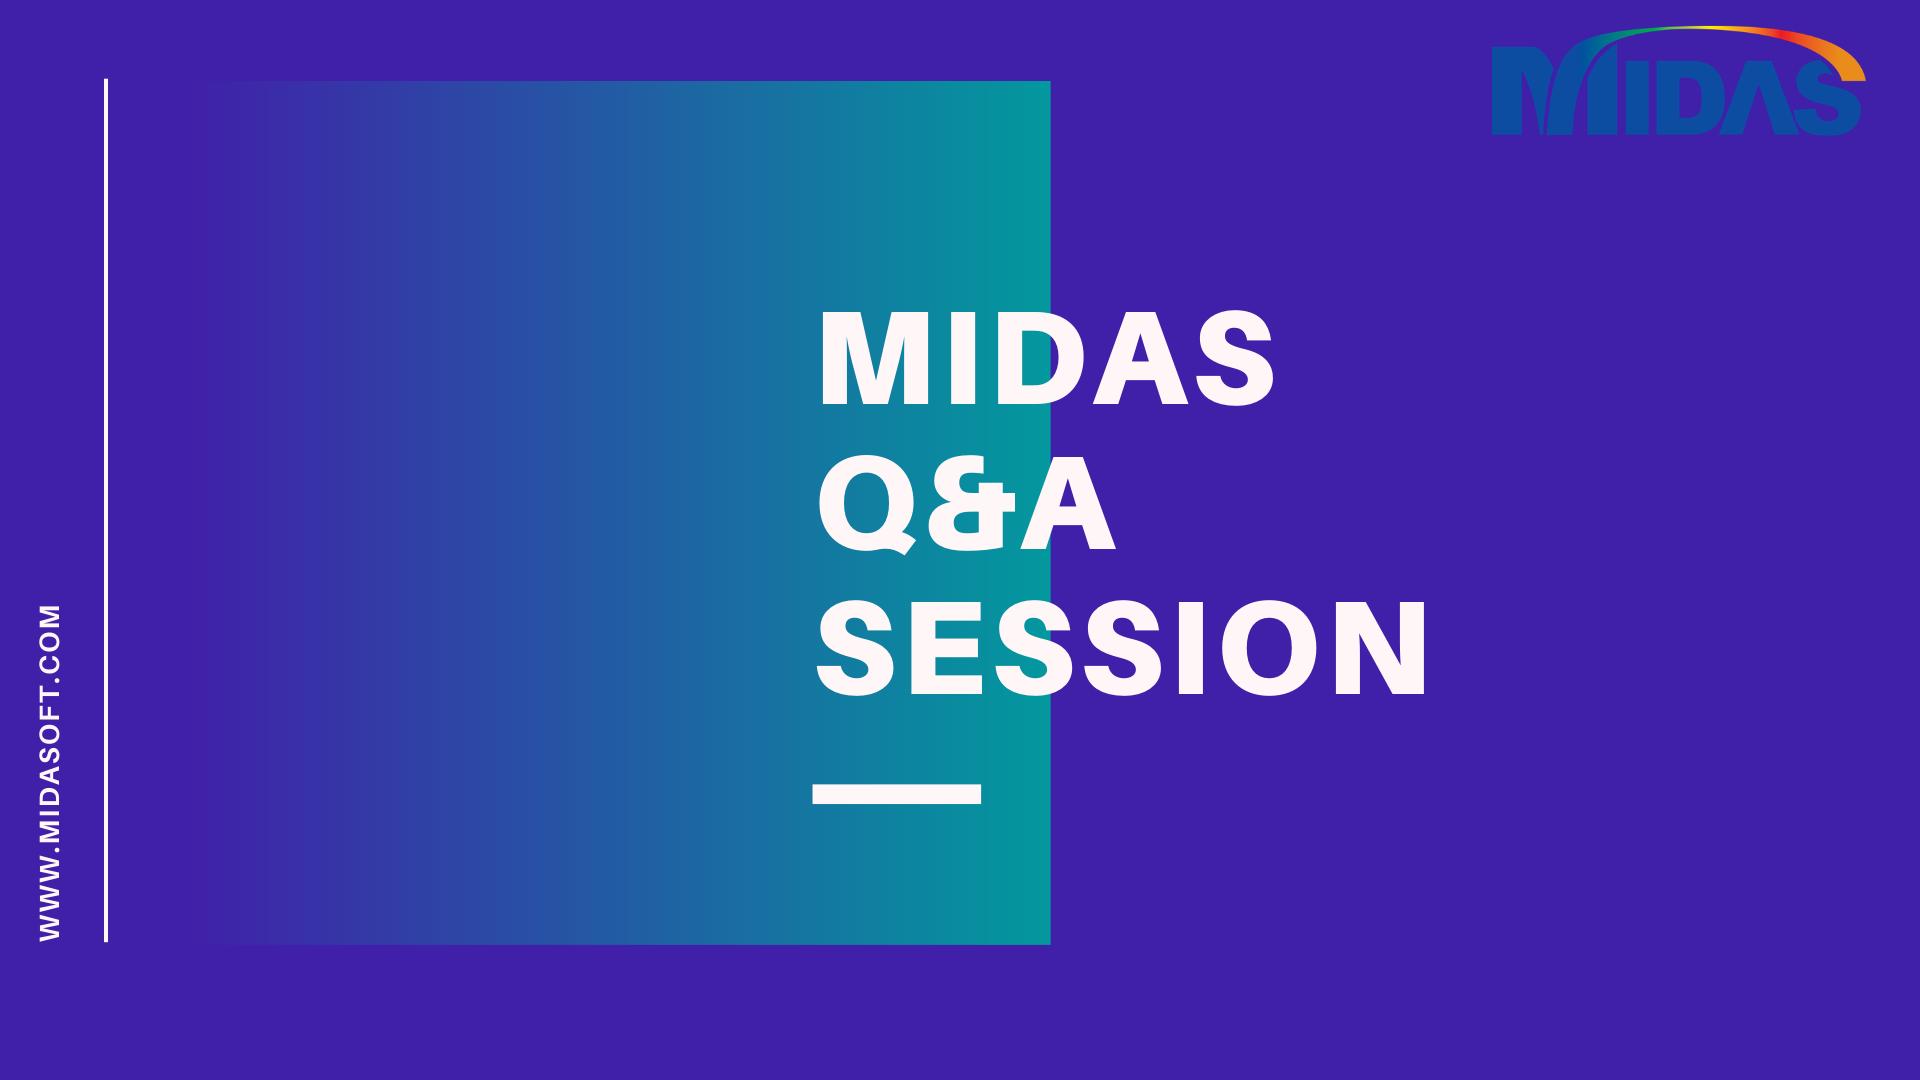 Midas Q&A Session - Amir Botros